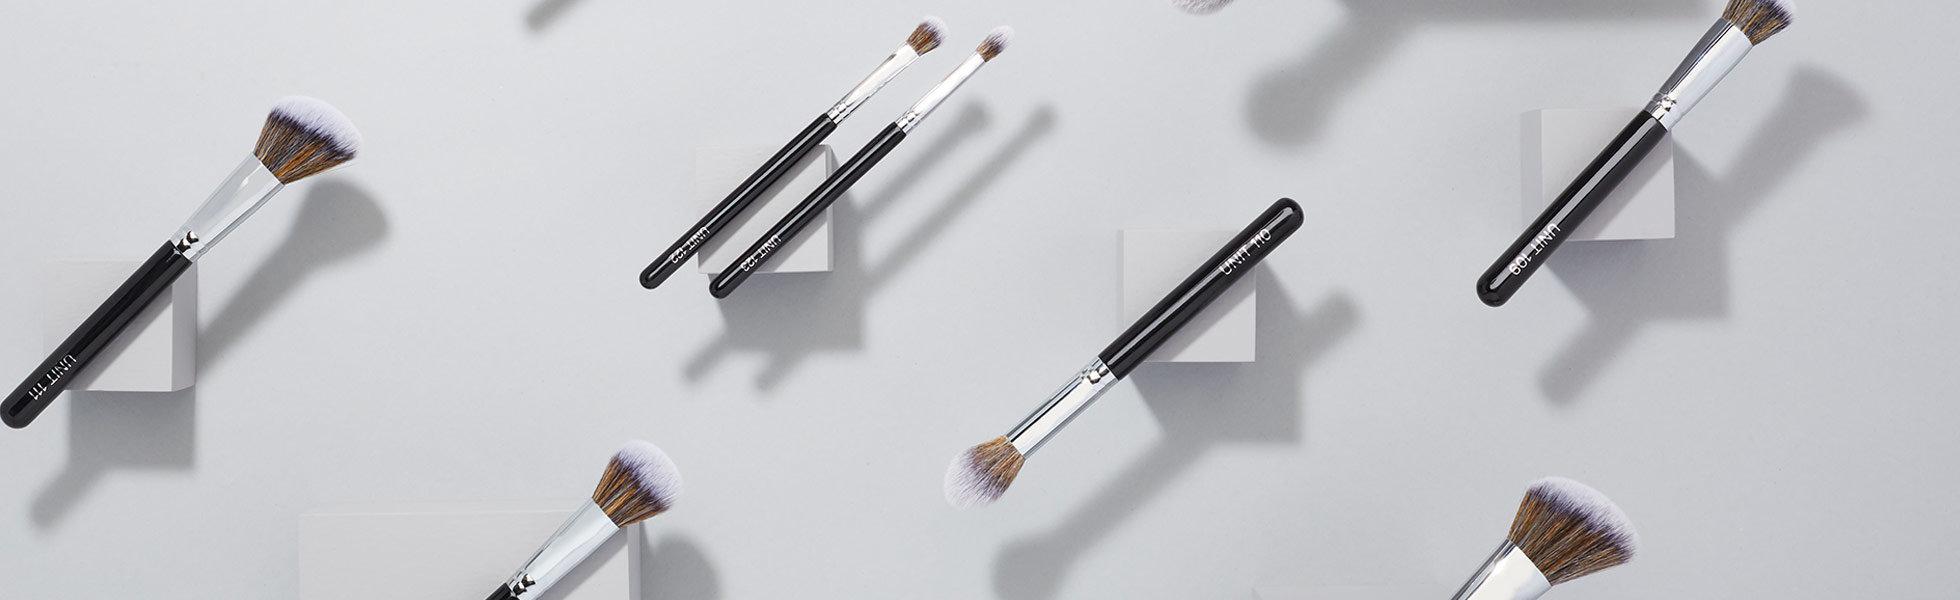 UNITS makeup brushes